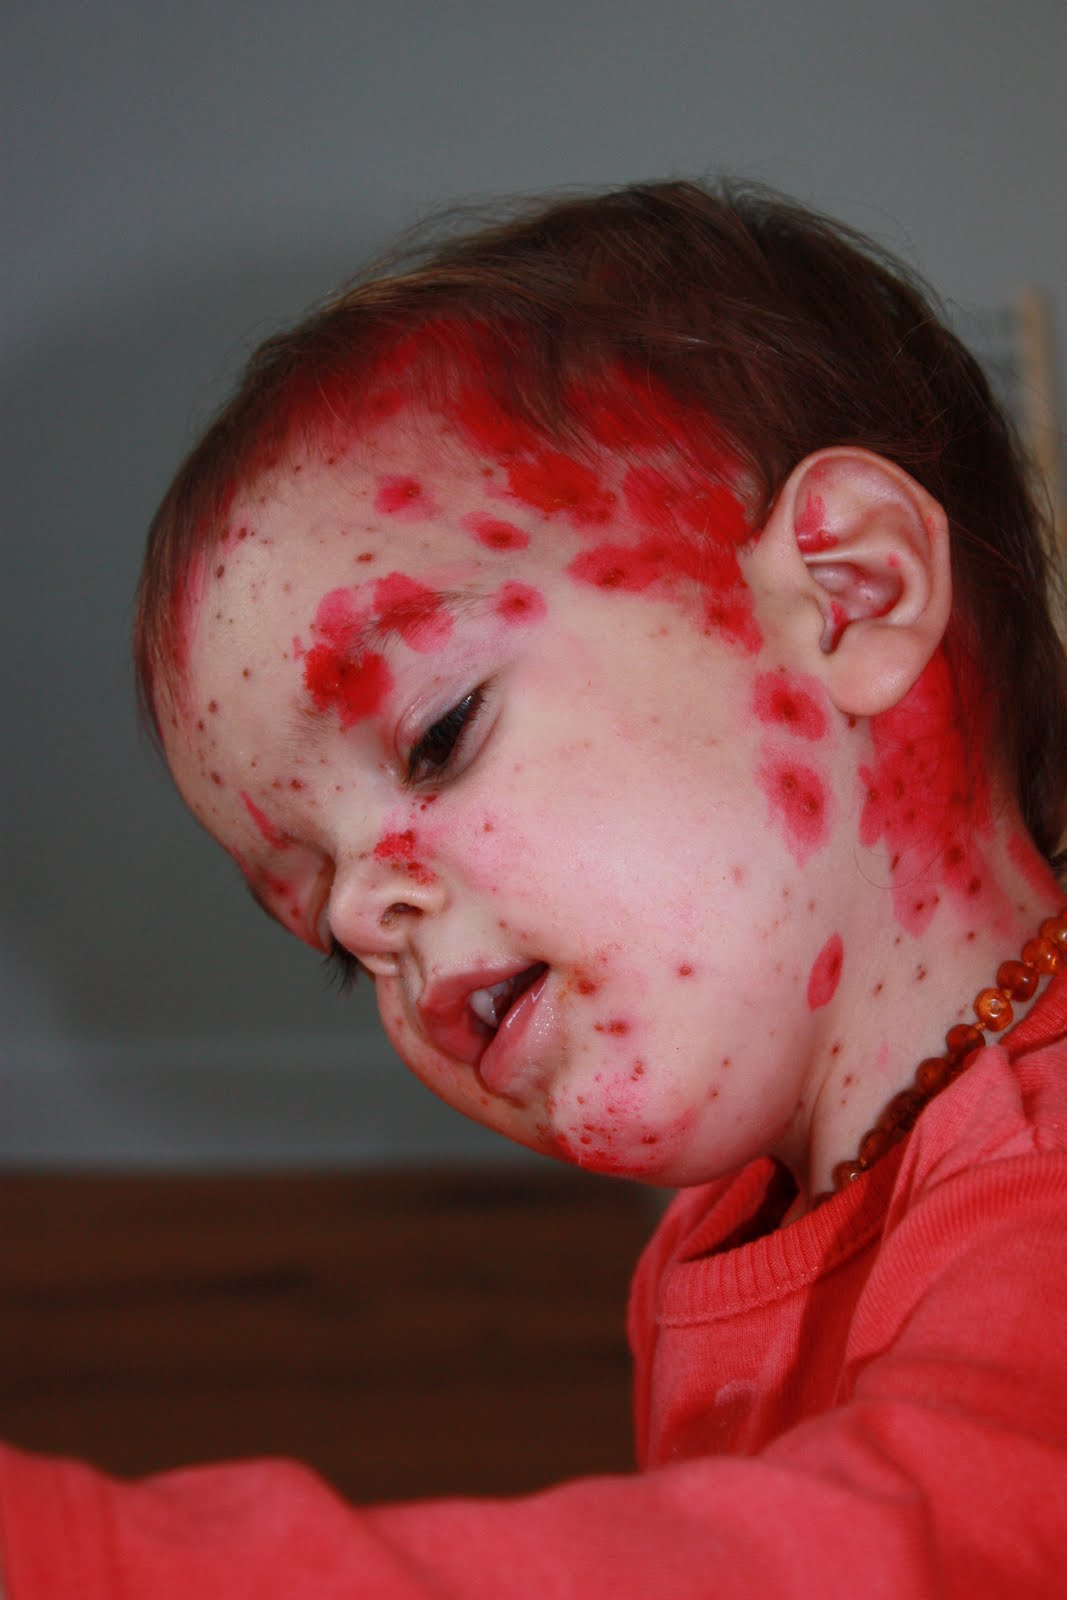 Zovirax varicelle bébé - Brand cialis canada